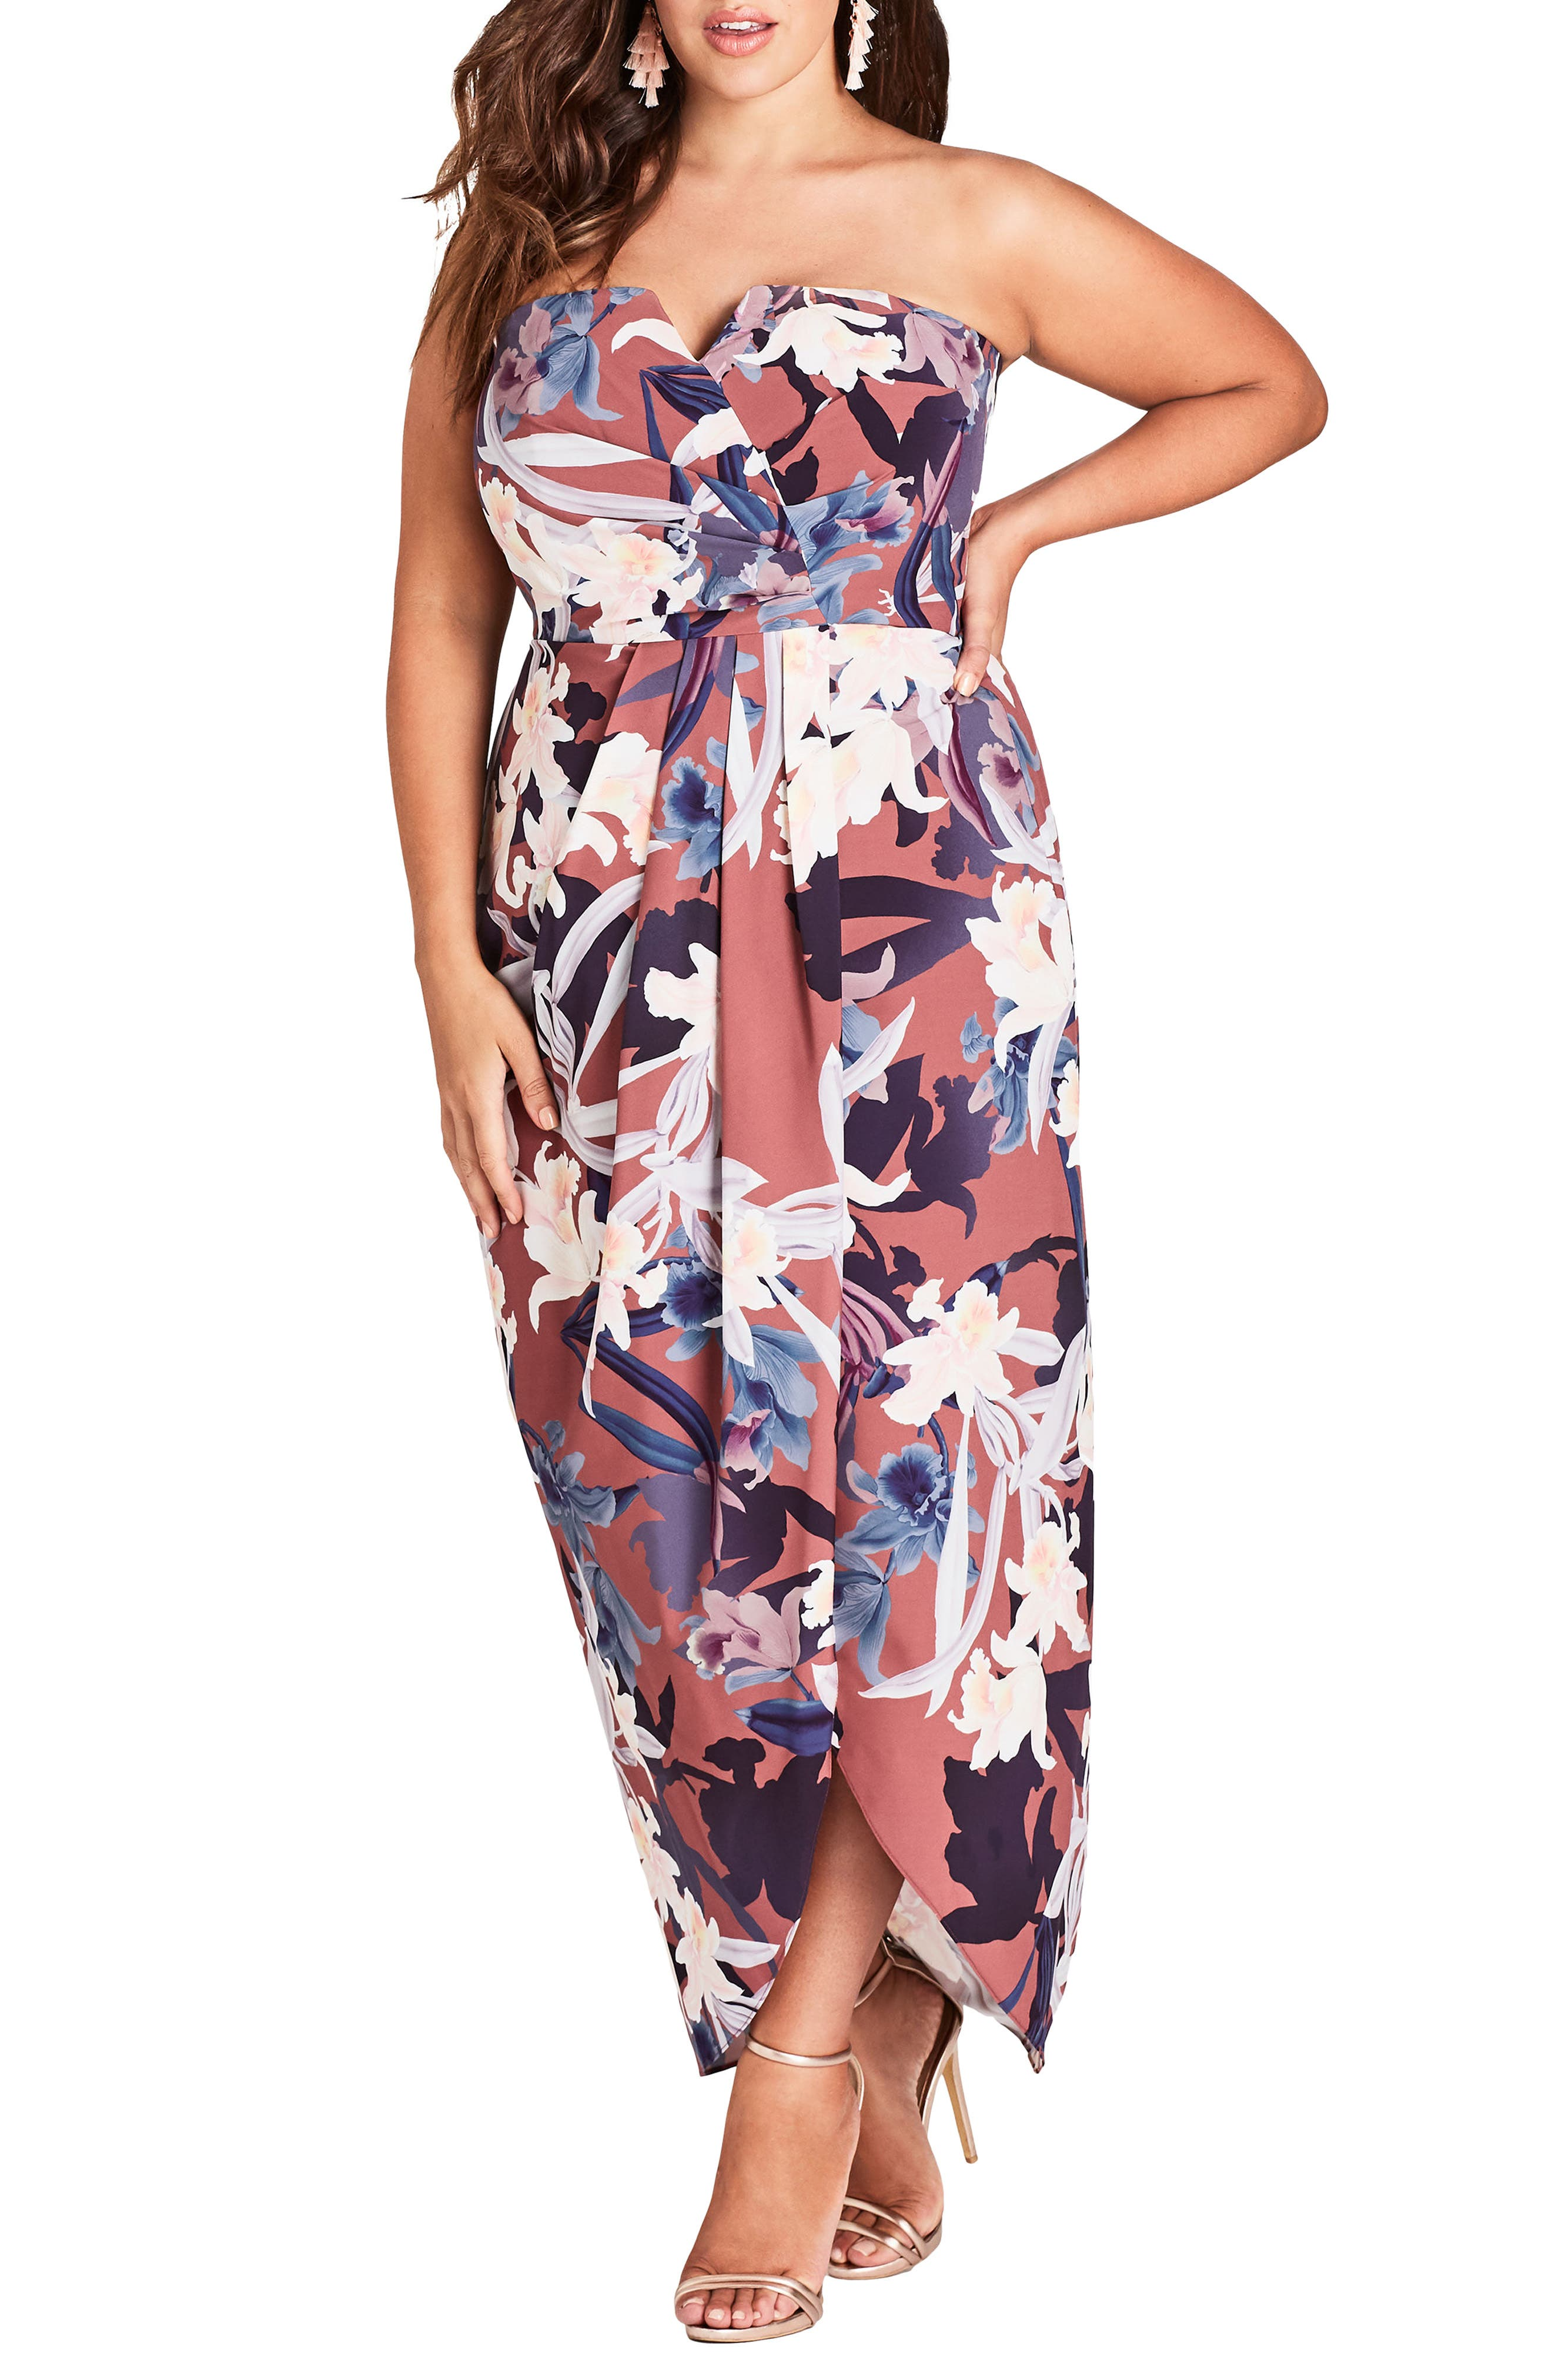 CITY CHIC Lavish Floral Strapless Dress, Main, color, 200